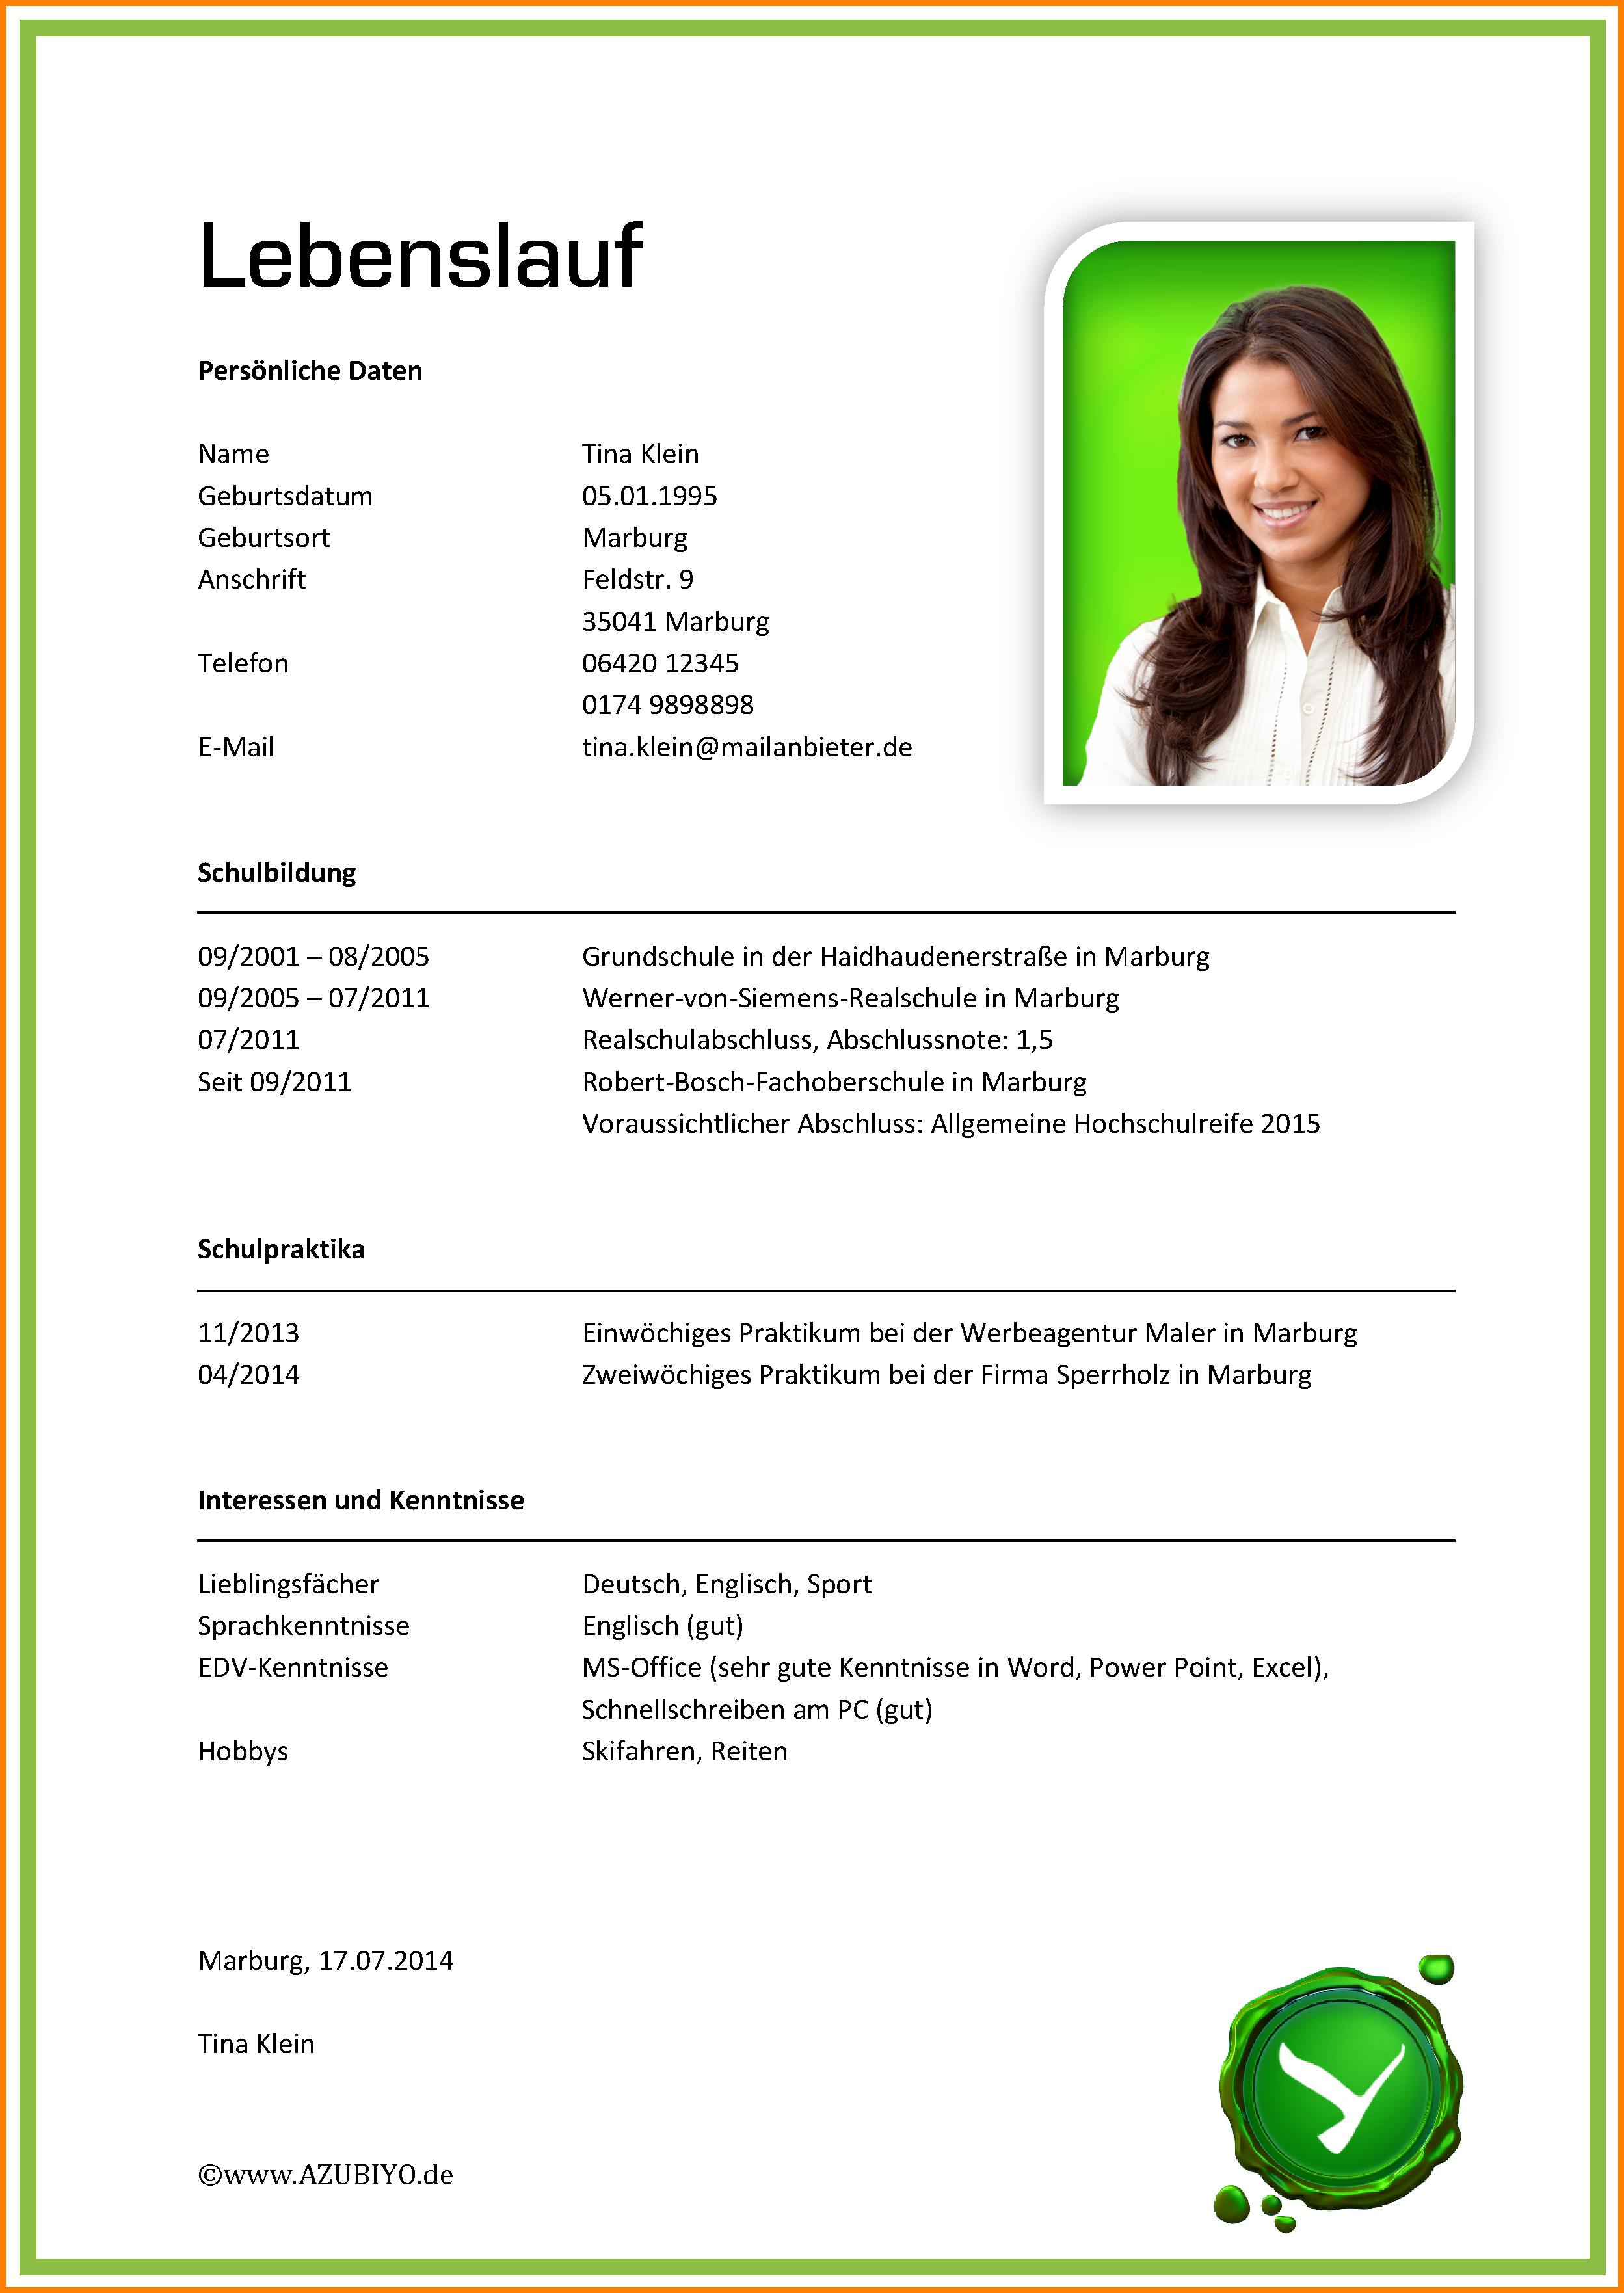 7 Lebenslauf Ausbildung Muster Recommendation Template Vorlage Twowaves Co Bio Data For Marriage Marriage Biodata Format Resume Format Download